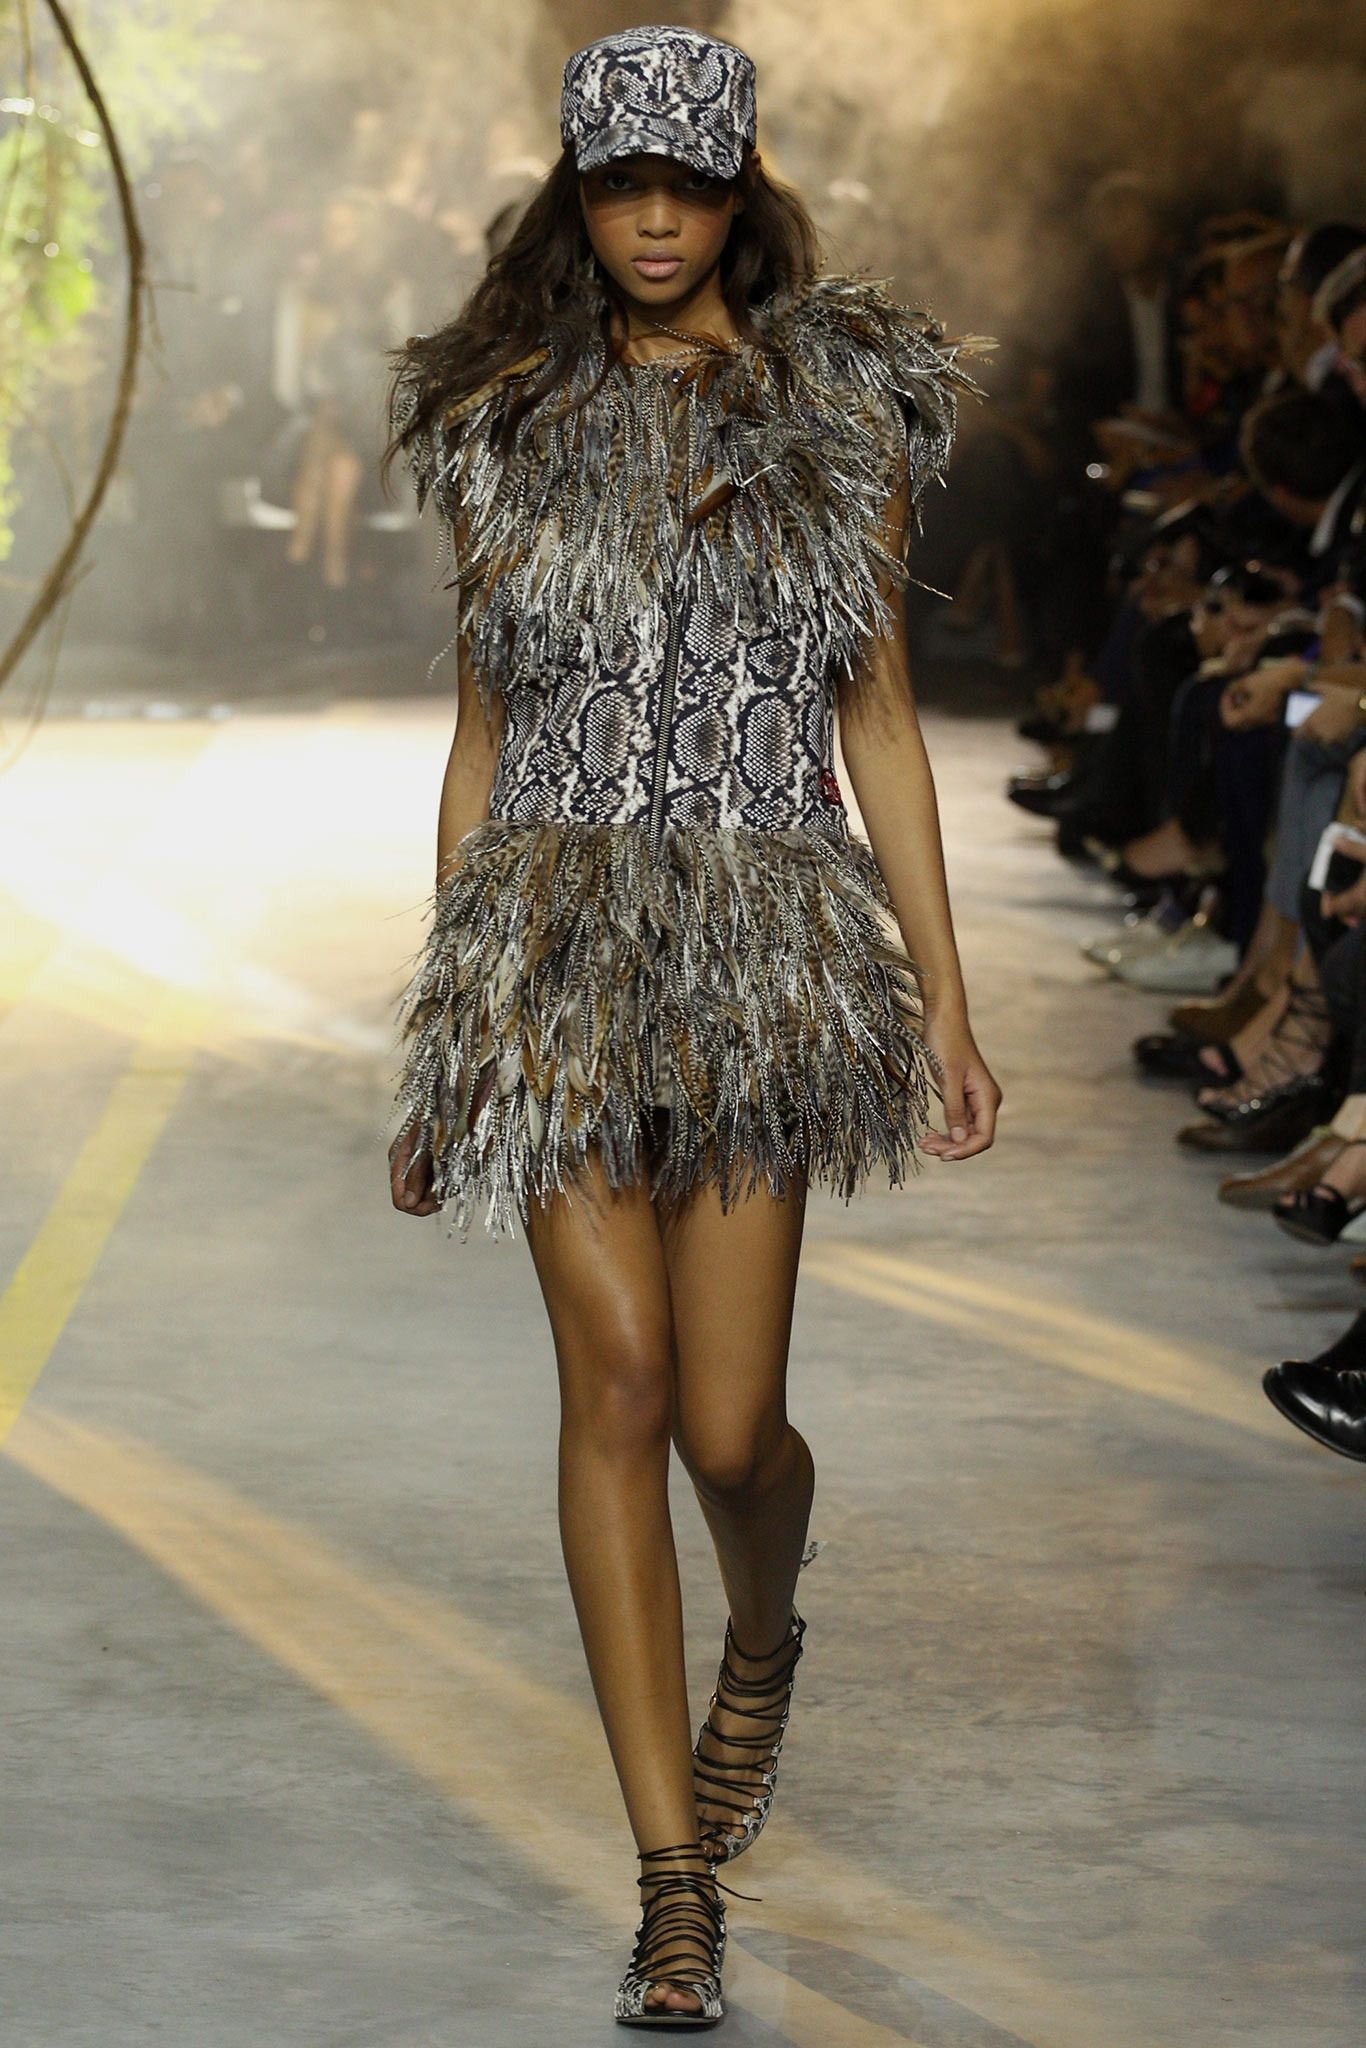 Love this wild dress. #MGRLZ2014 #fashion